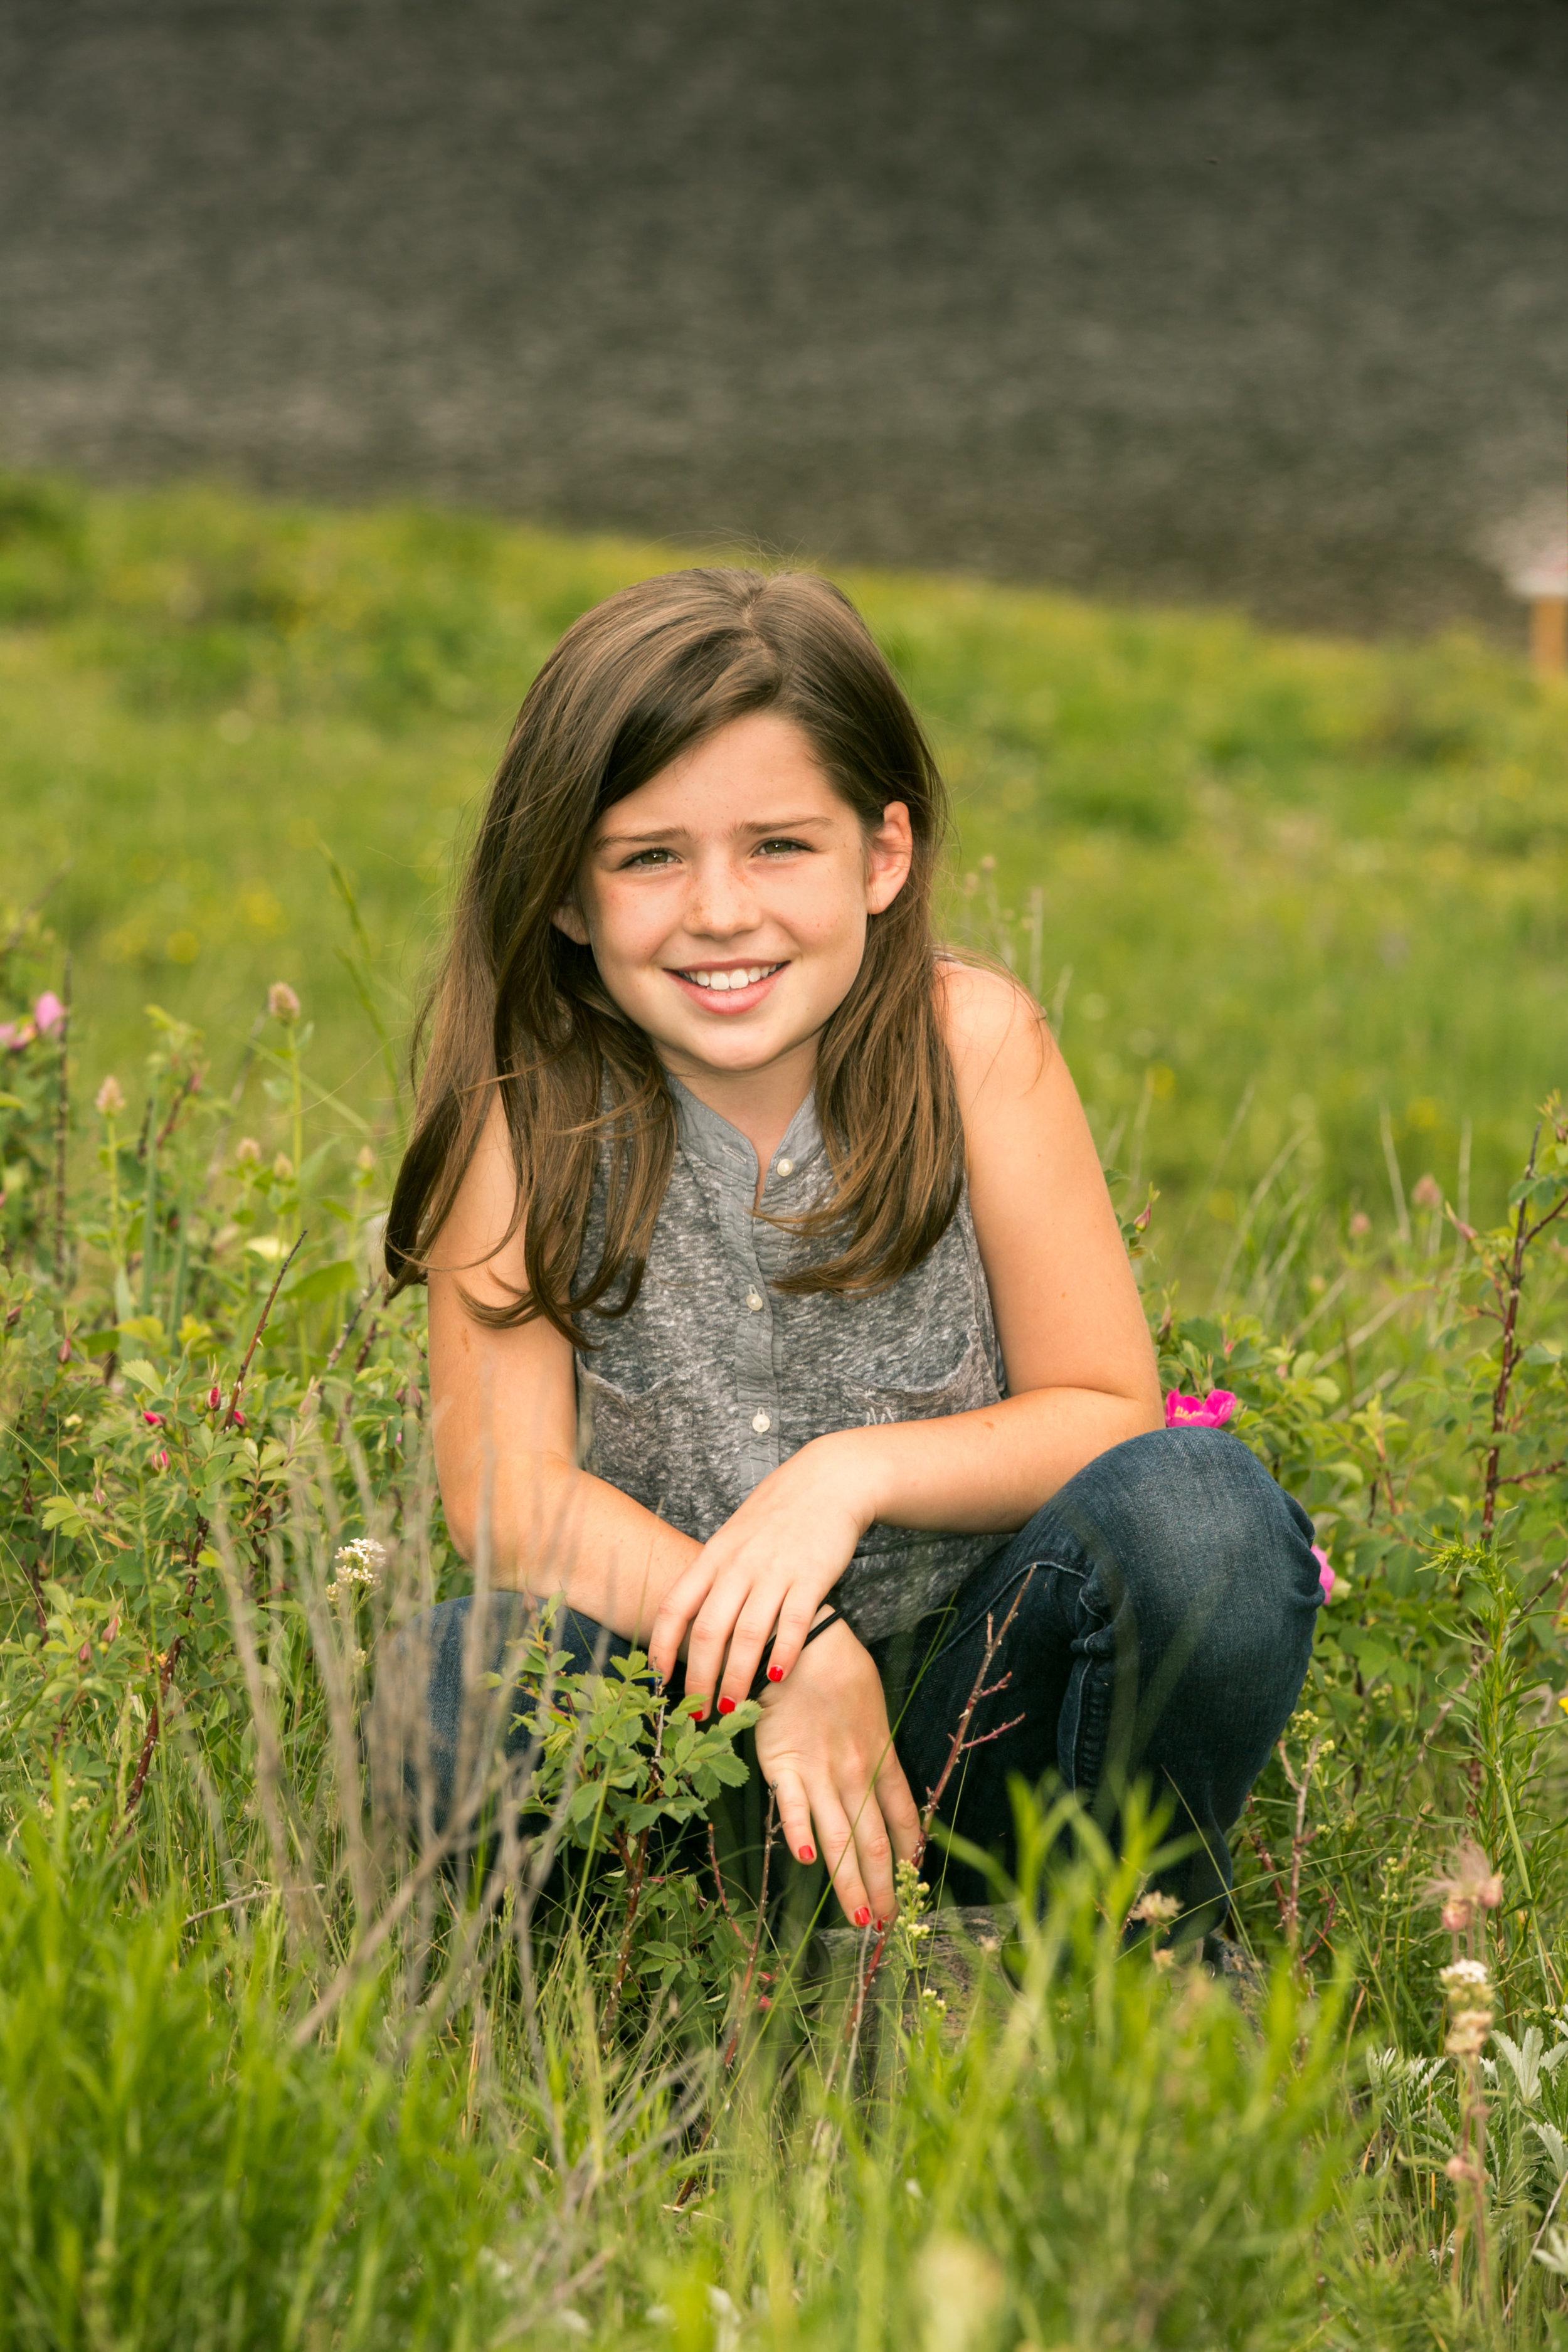 best-photographer-childrens-portraits-vail-Axelphoto.jpg